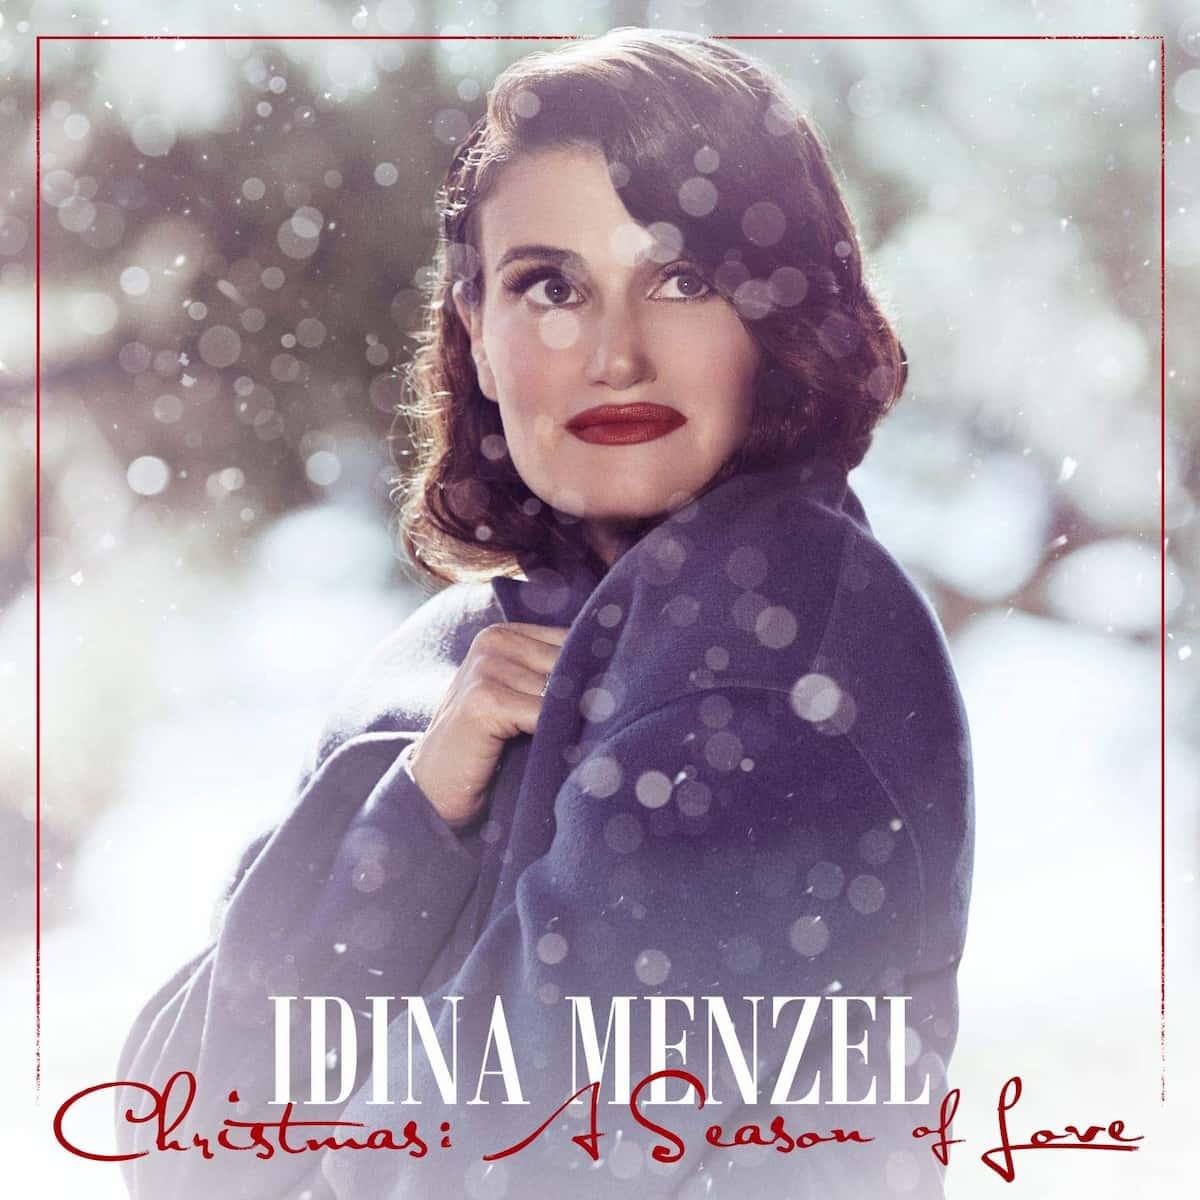 Idina Menzel Christmas A Season of Love - Weihnachts-CD 2019